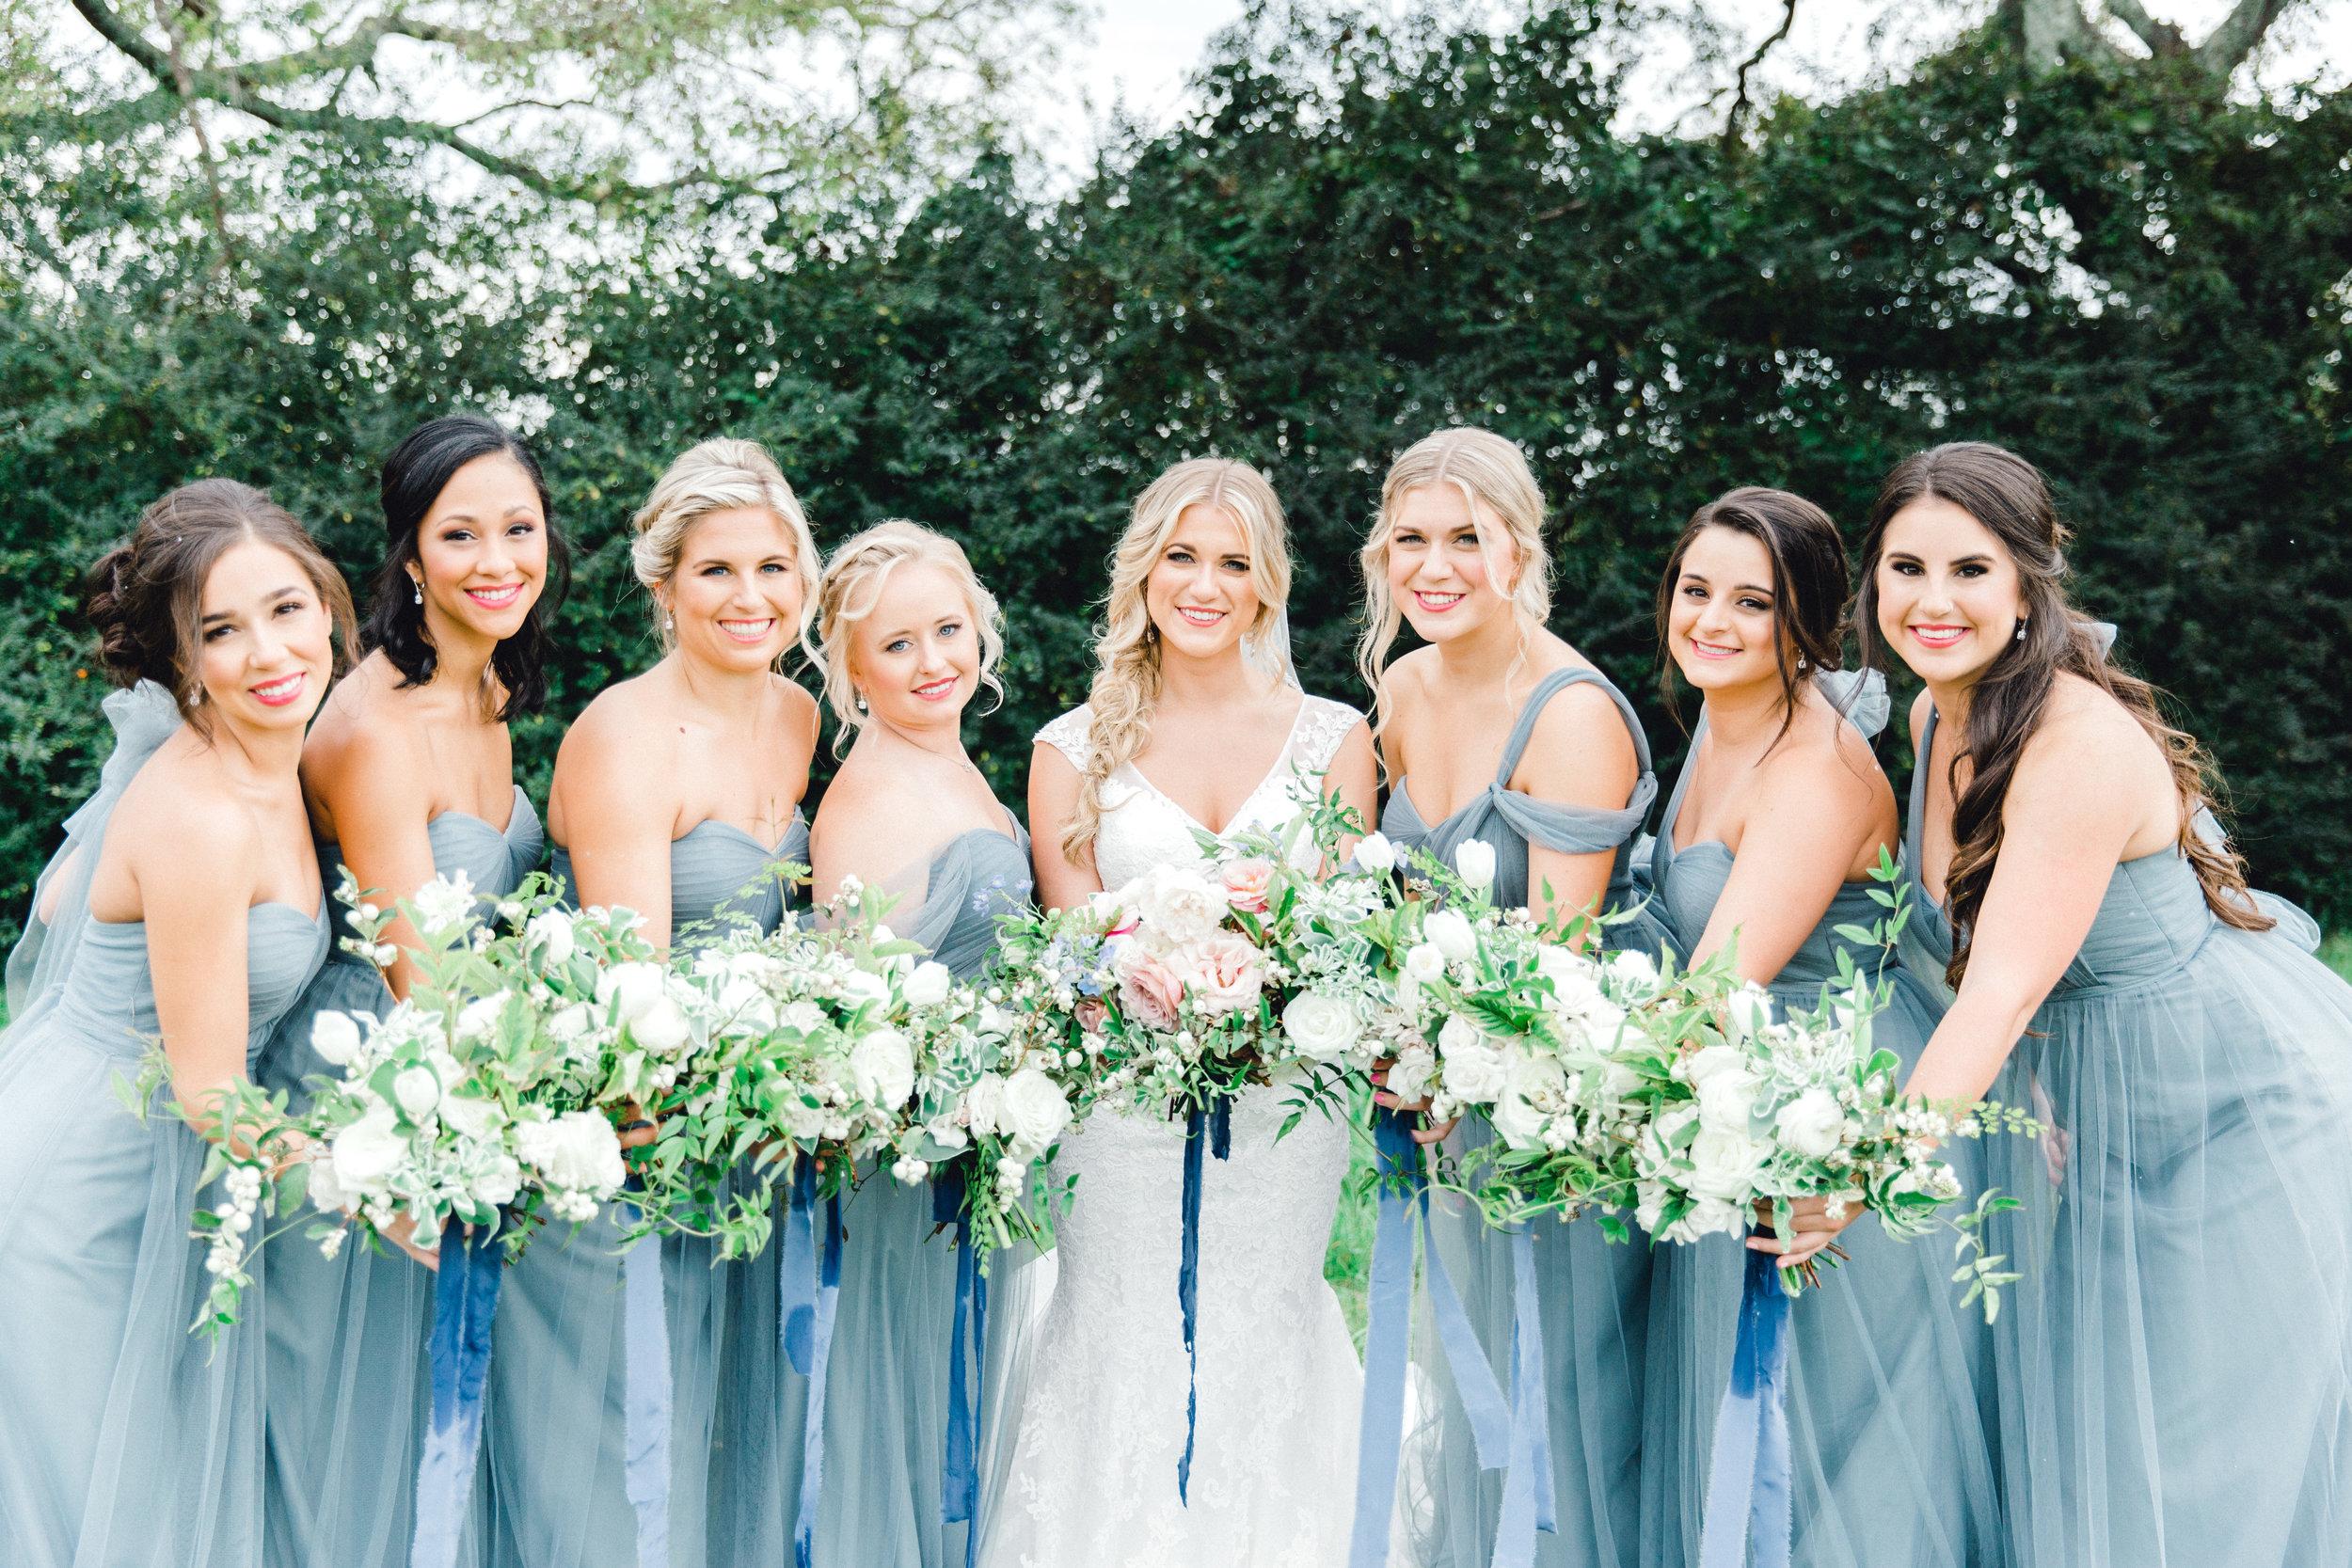 Paige-Mercer-Photography-Florida-Wedding-Photographer-Alyssa&Drew-33.jpg